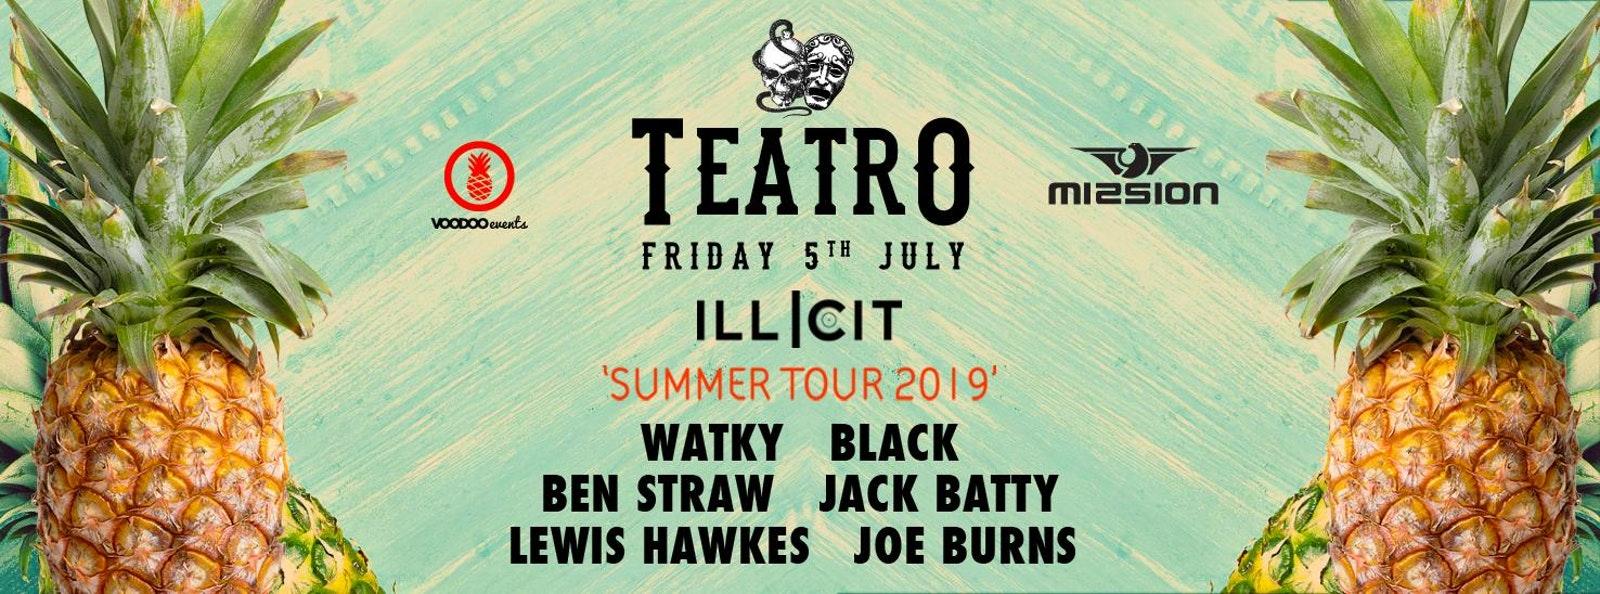 Teatro x Illicit : Summer Tour – Mission Leeds